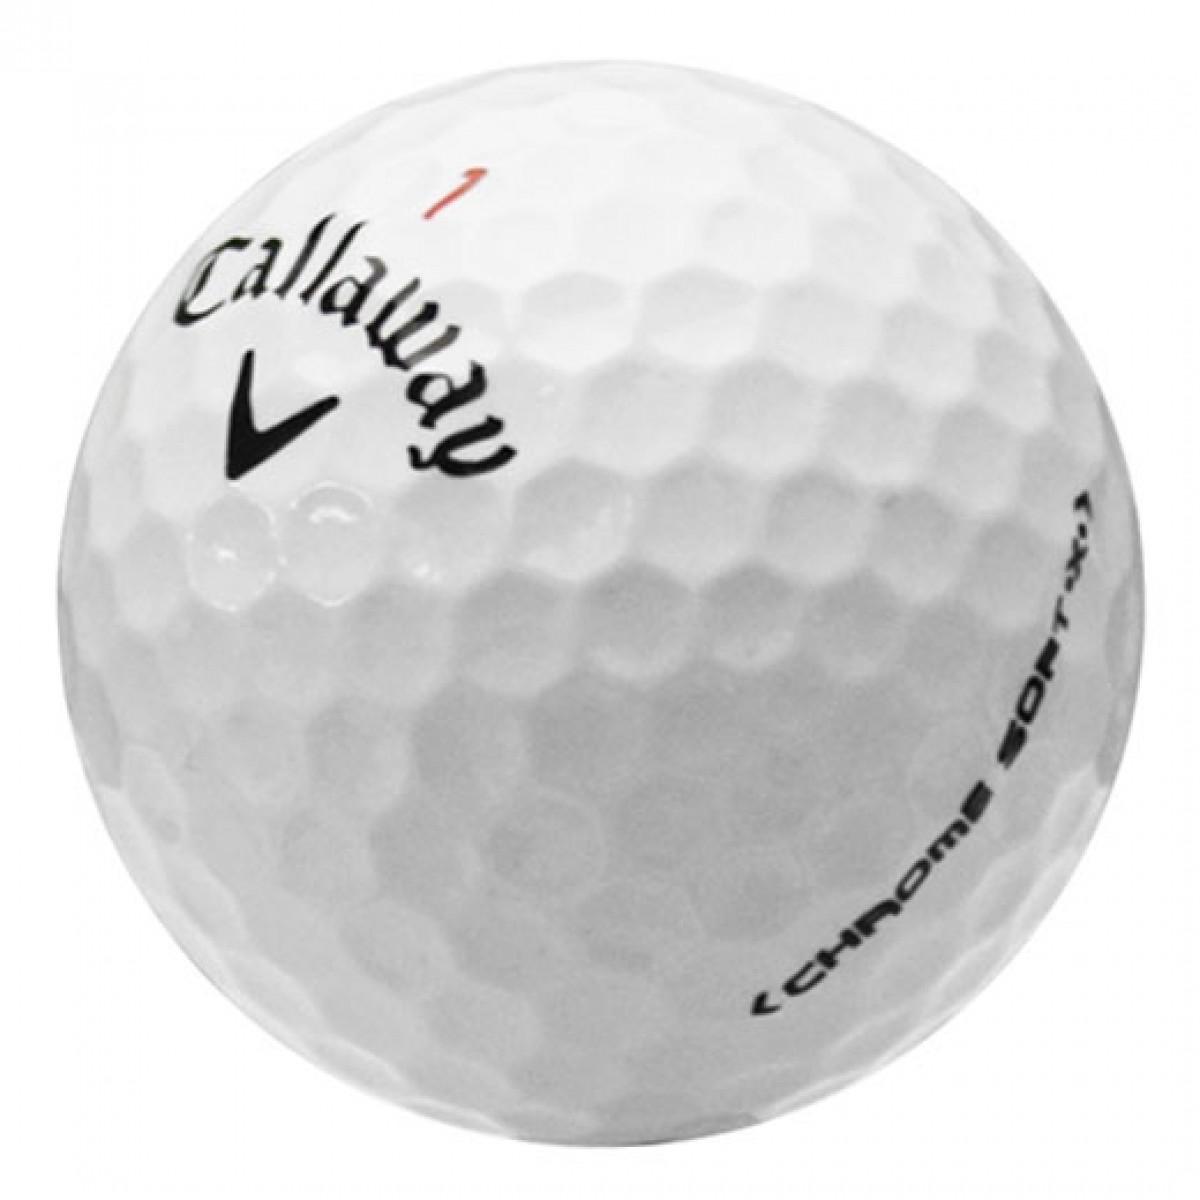 Callaway Chrome Soft X Used Golf Balls